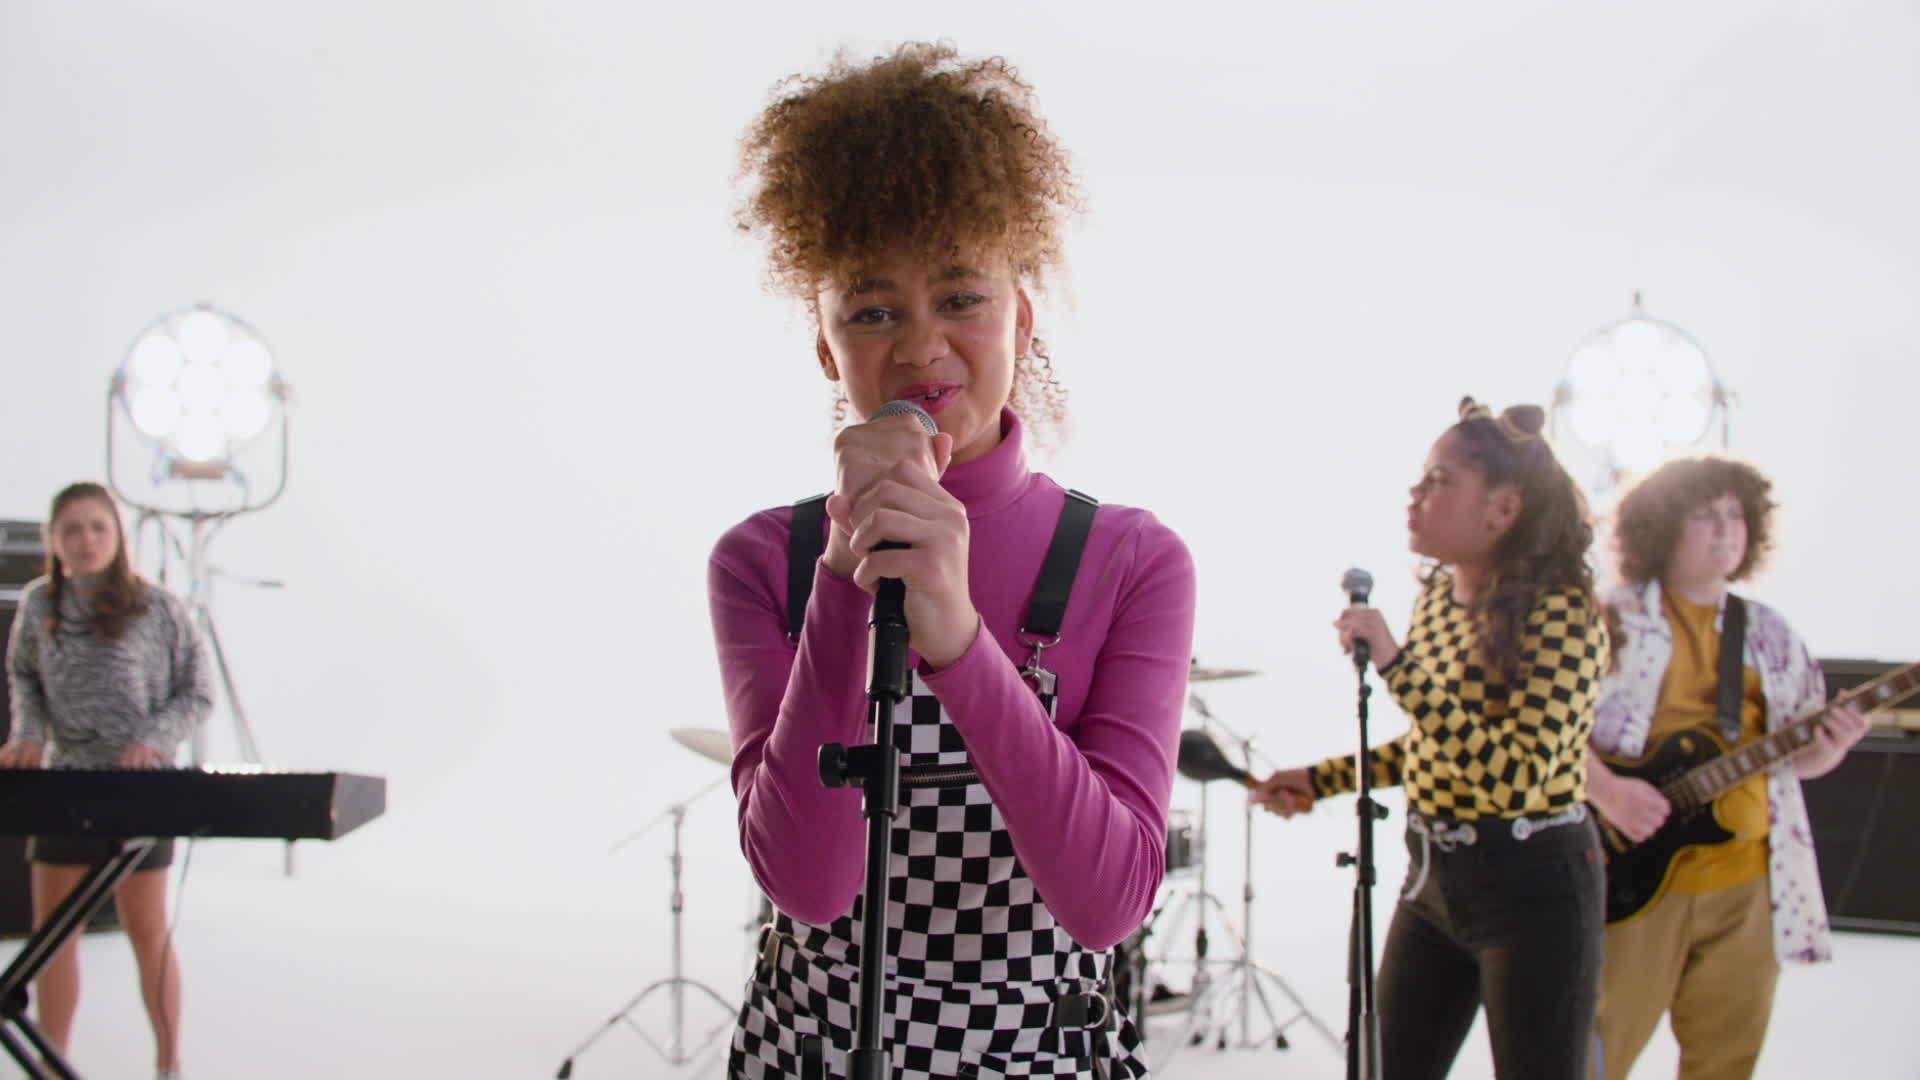 Music Video: Everything's Magic